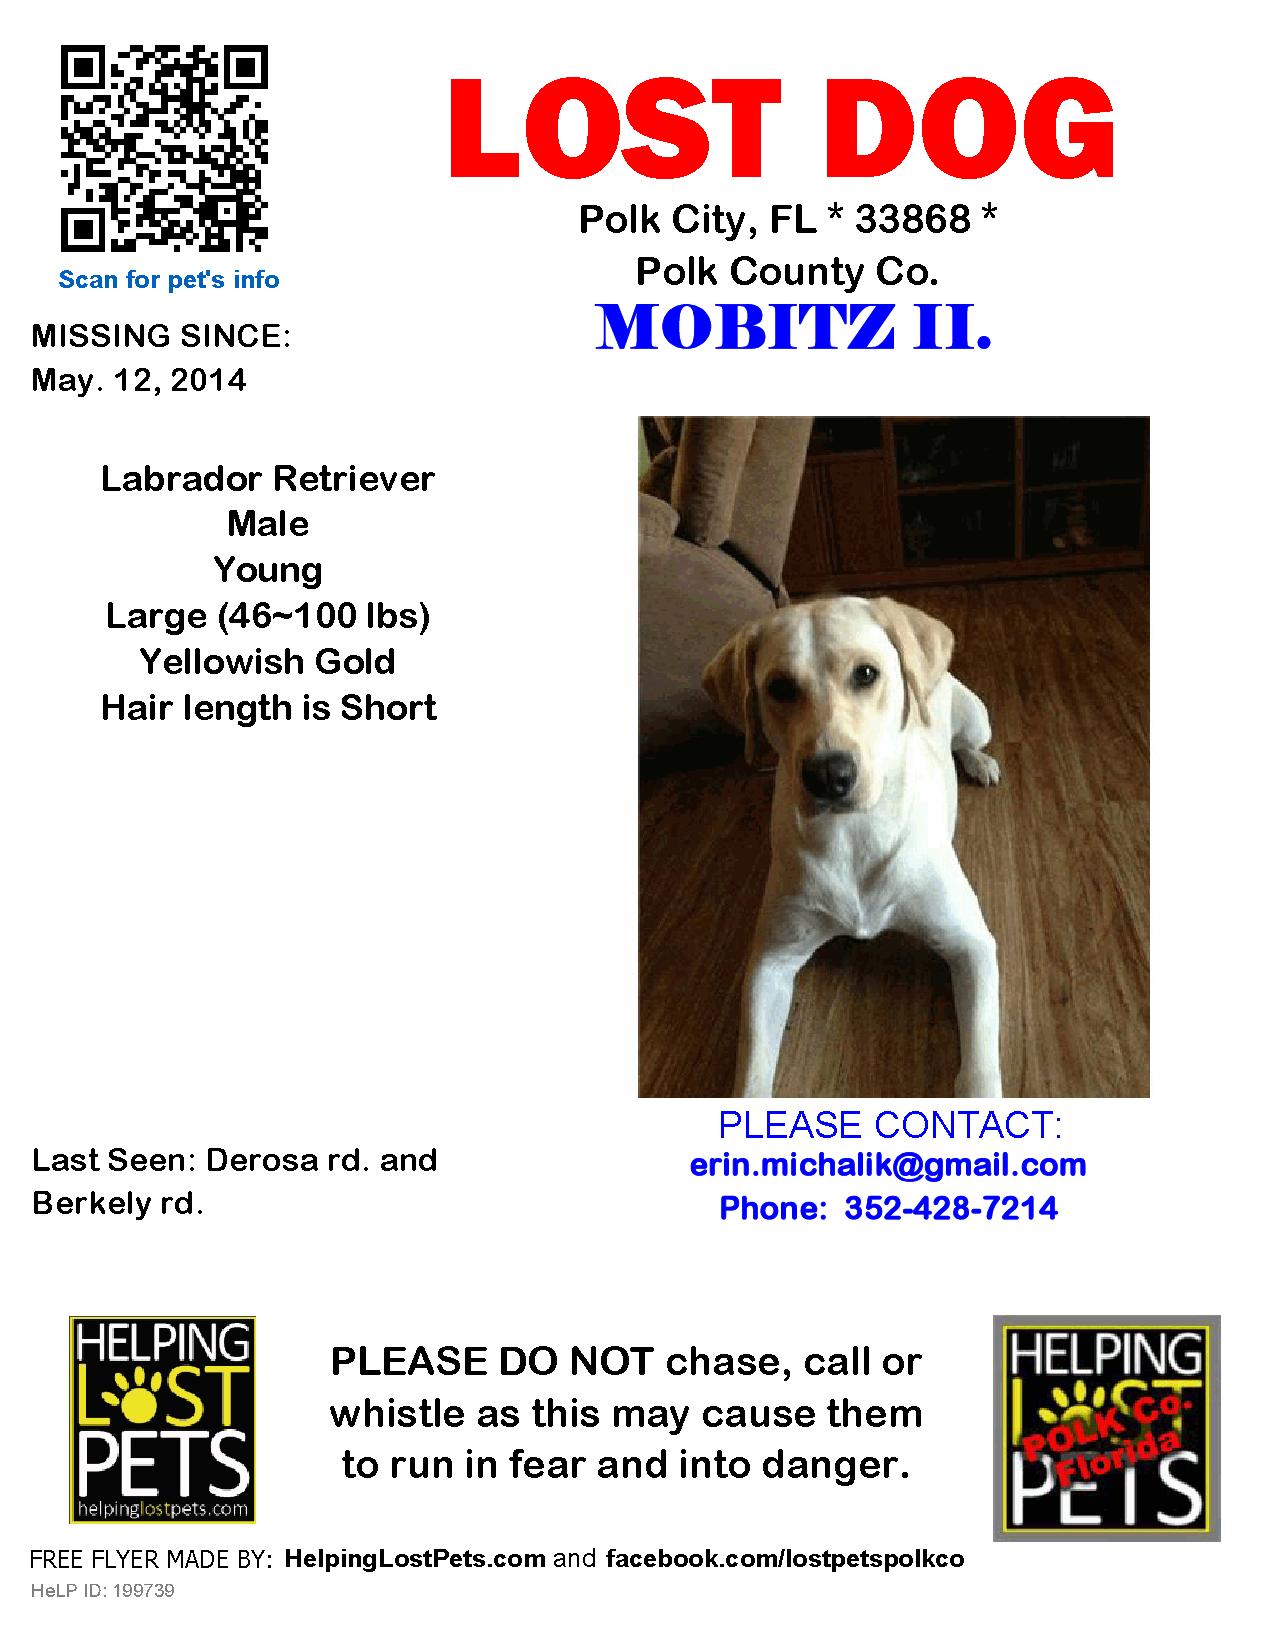 Lostdog Polk County Fl Polk City Http Www Helpinglostpets Com Petdetail Id 199739 Losing A Dog Polk County Polk